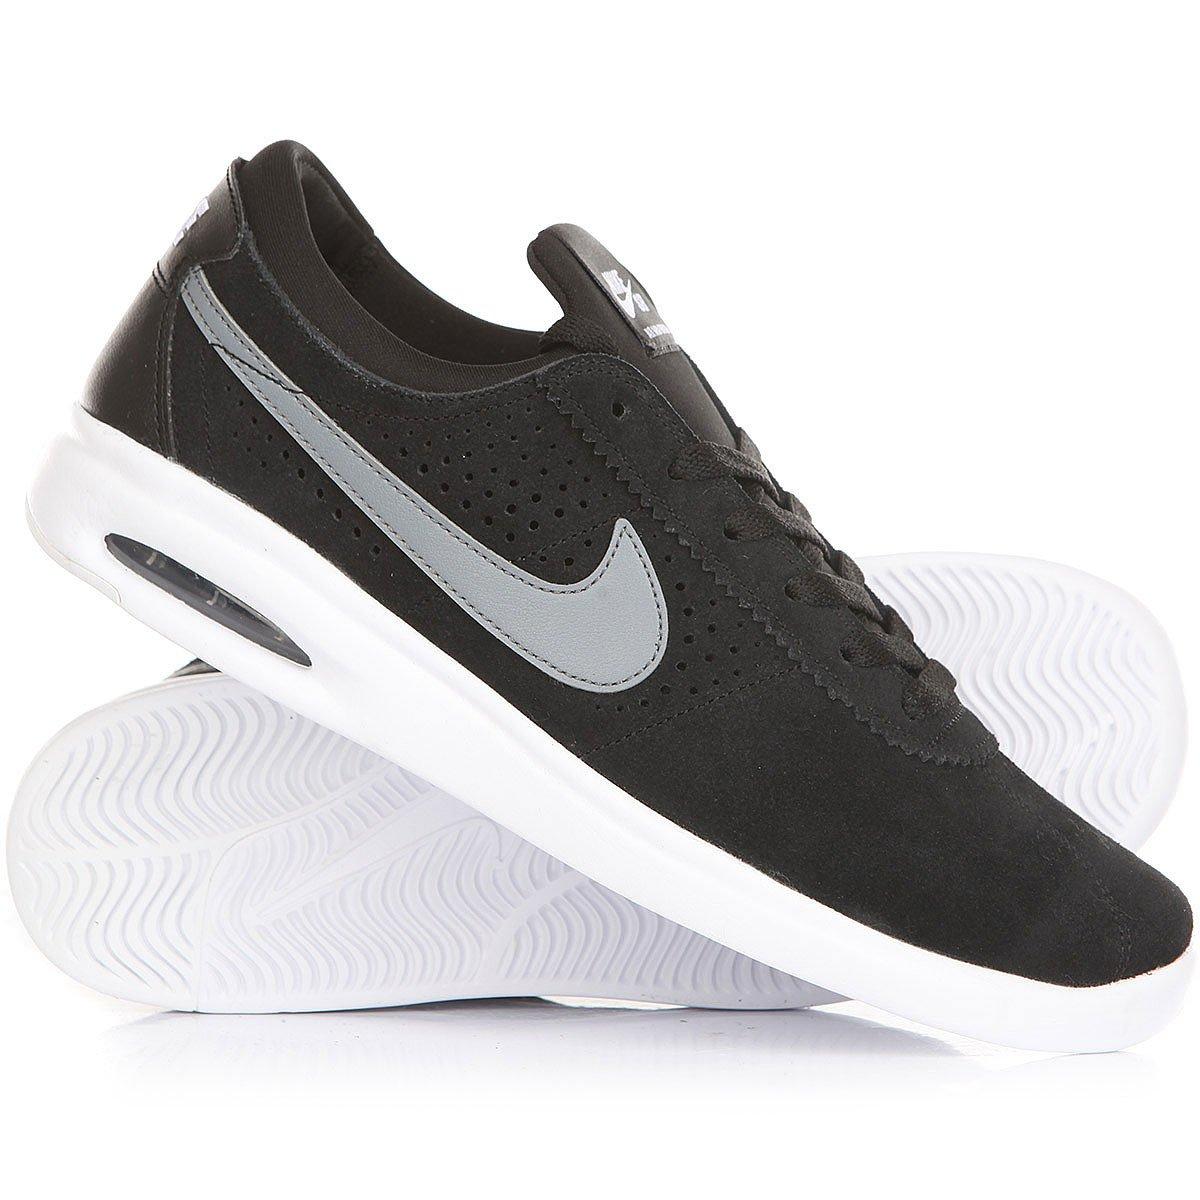 8e8dcf16f149 Купить кроссовки Nike SB Bruin Max Vapor Black Cool Grey (882097-001 ...